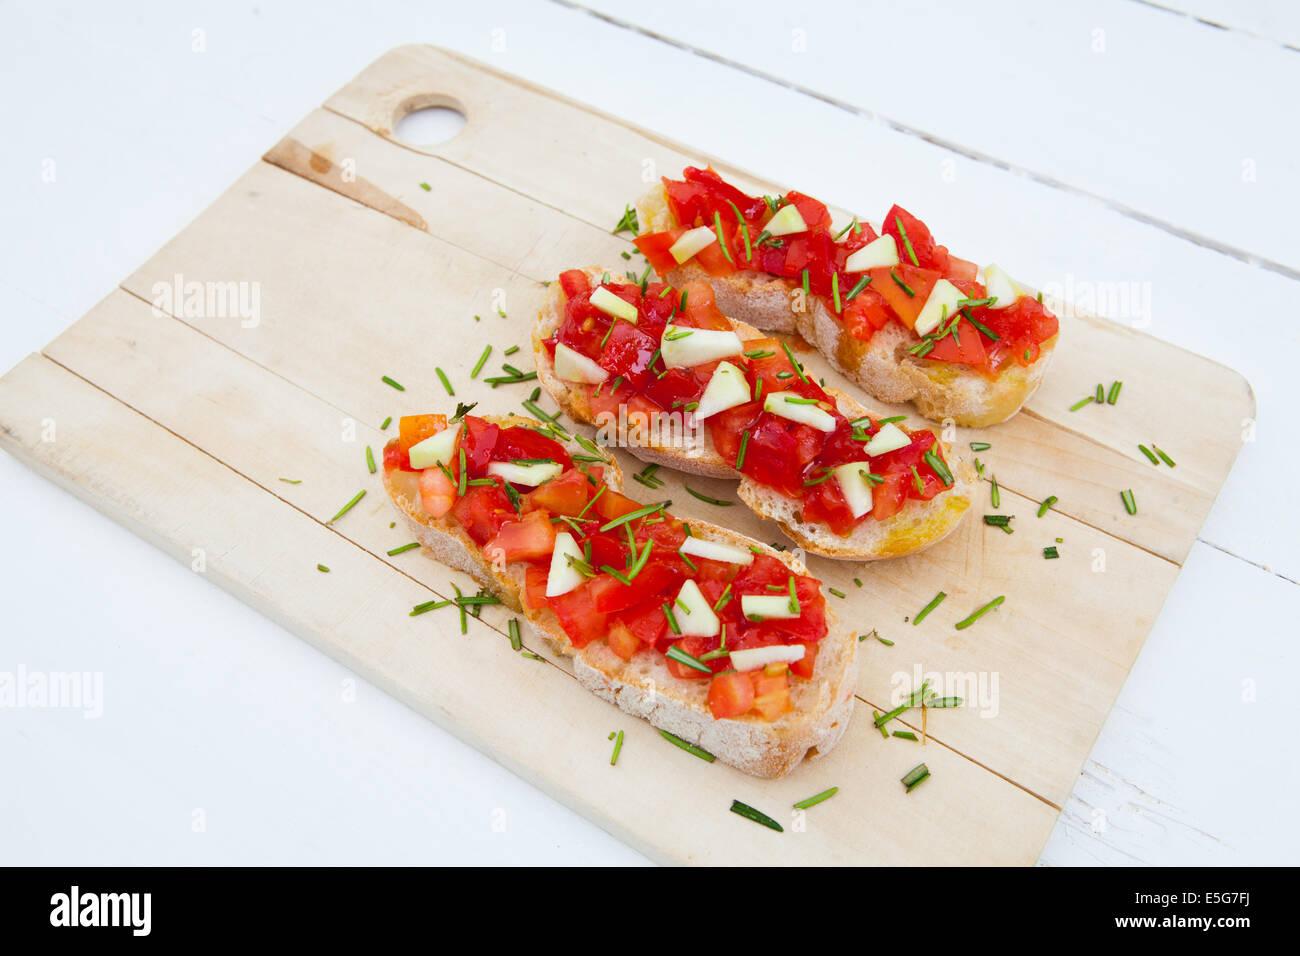 Ready to eat italian bruschetta with tomatoes and rosemary Stock Photo